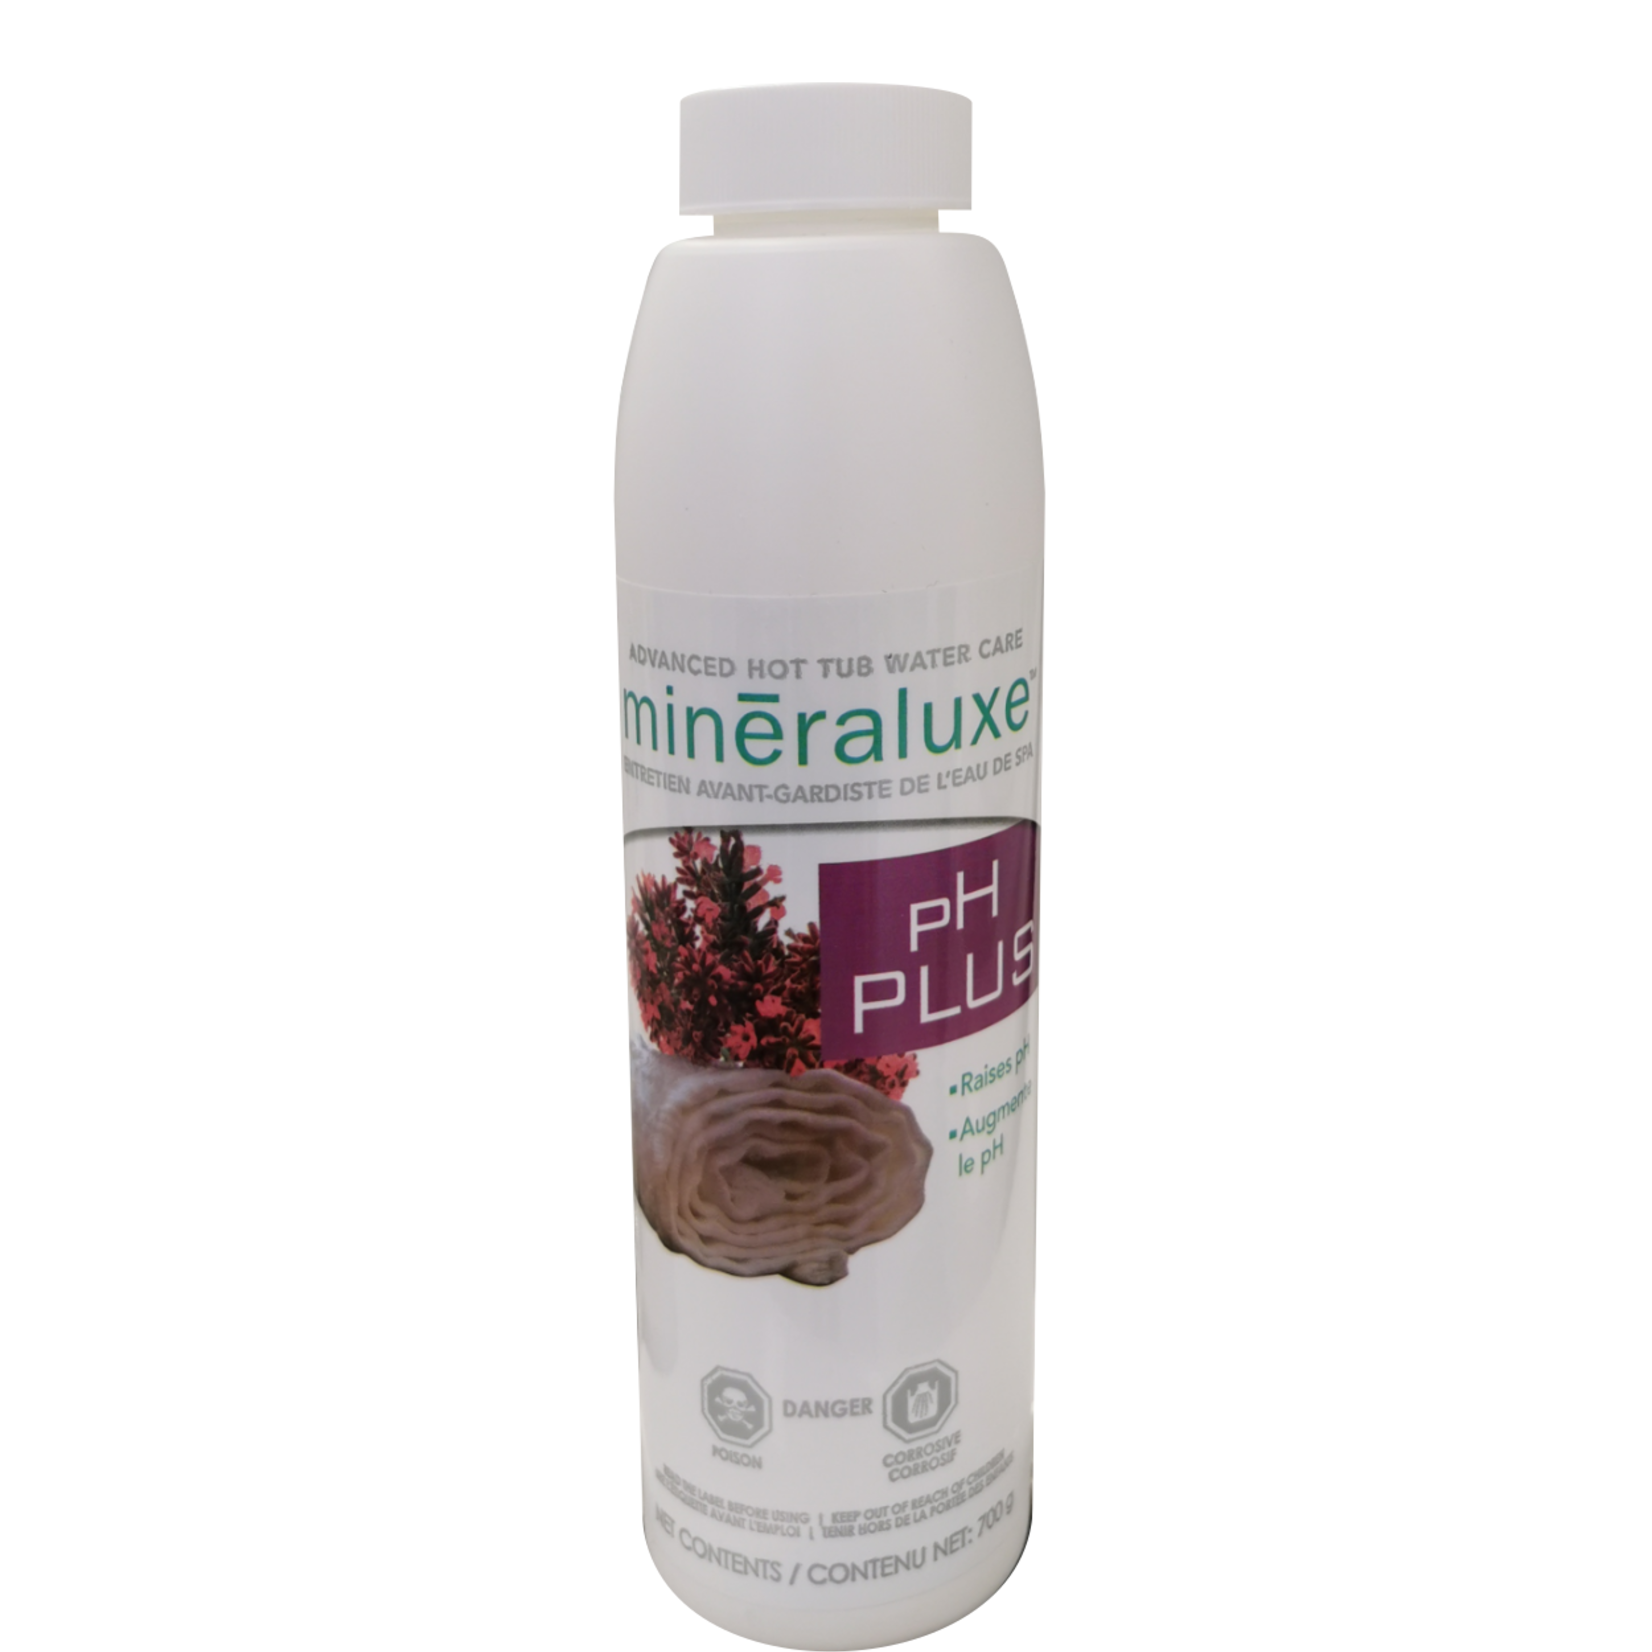 Mineraluxe pH Plus (700 g)